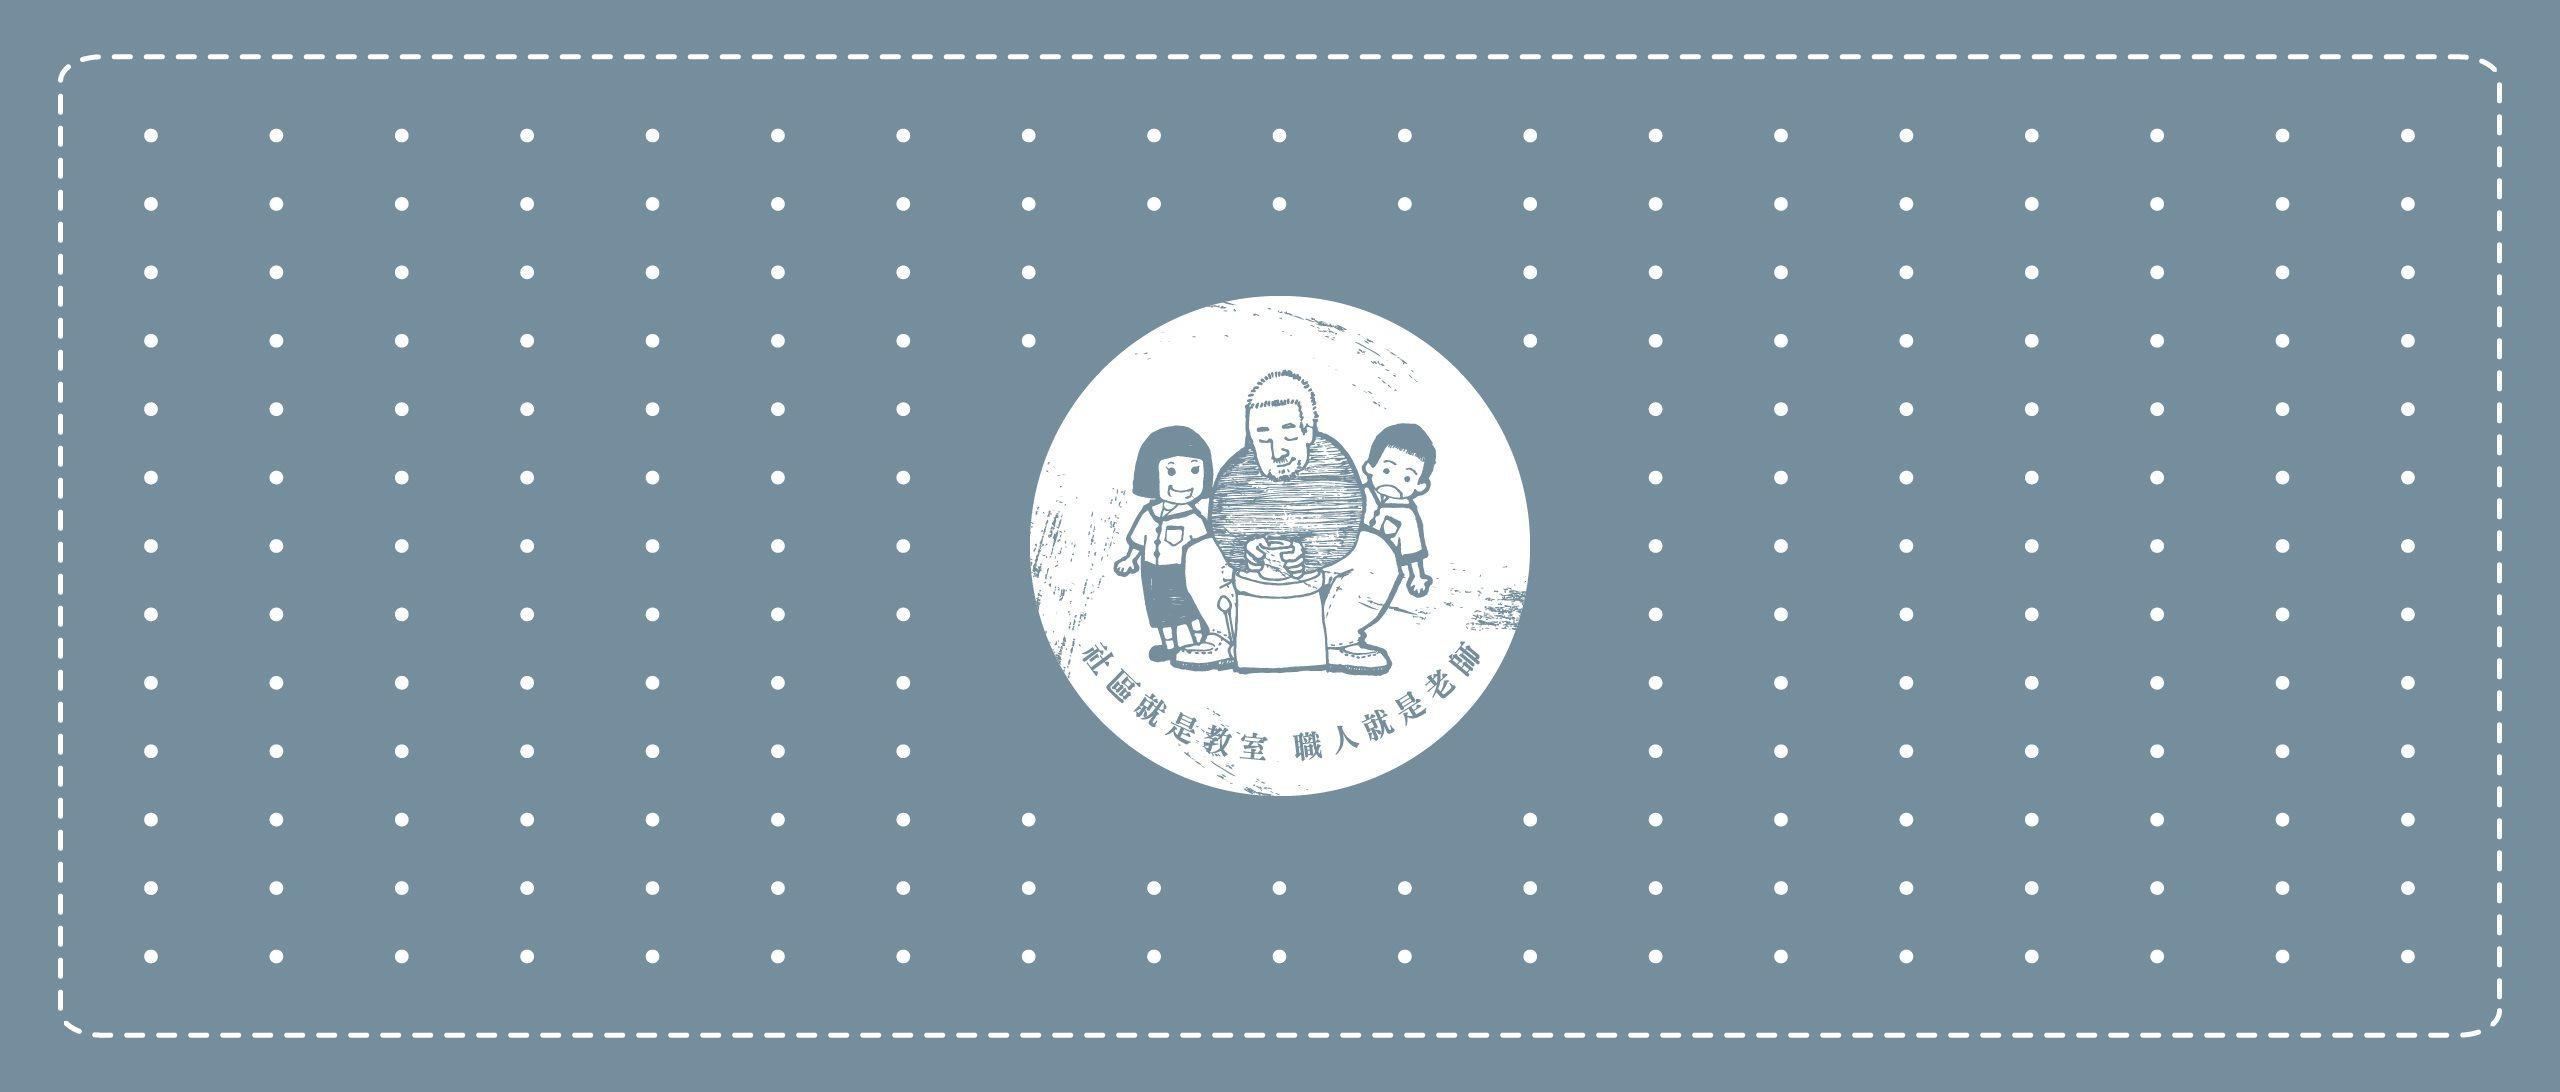 Design of Materials for Shokunin School